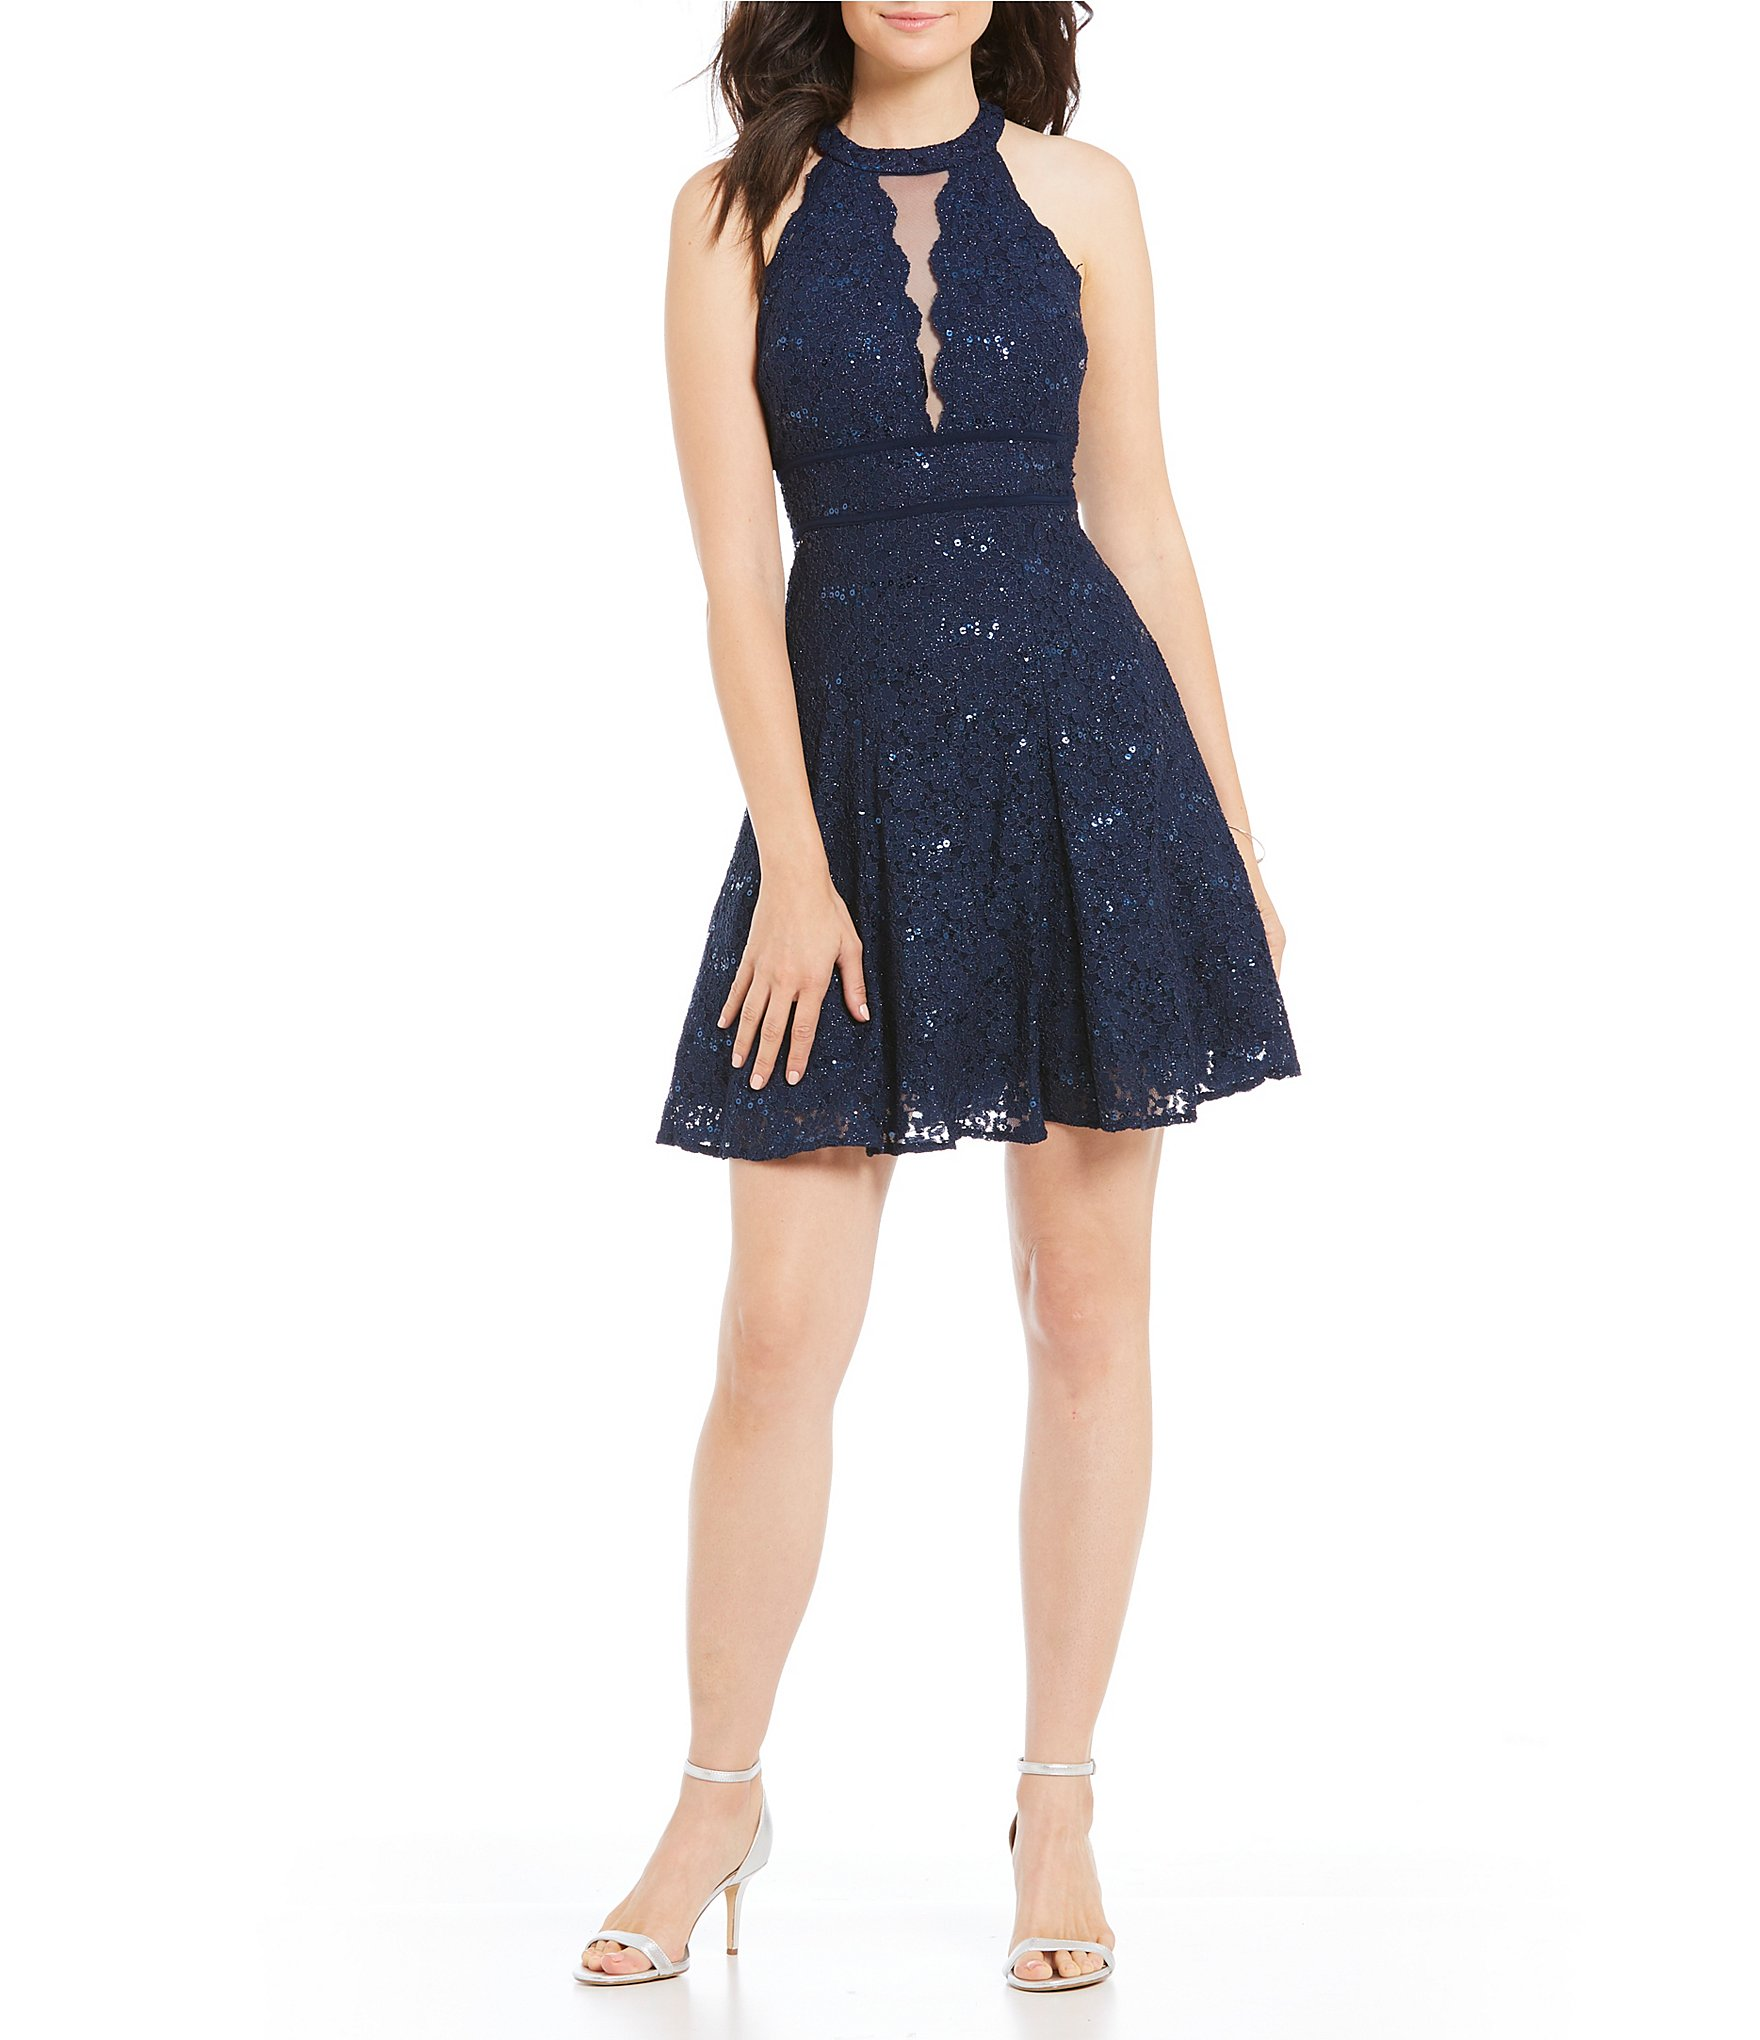 Juniors Lace Dresses Dillards